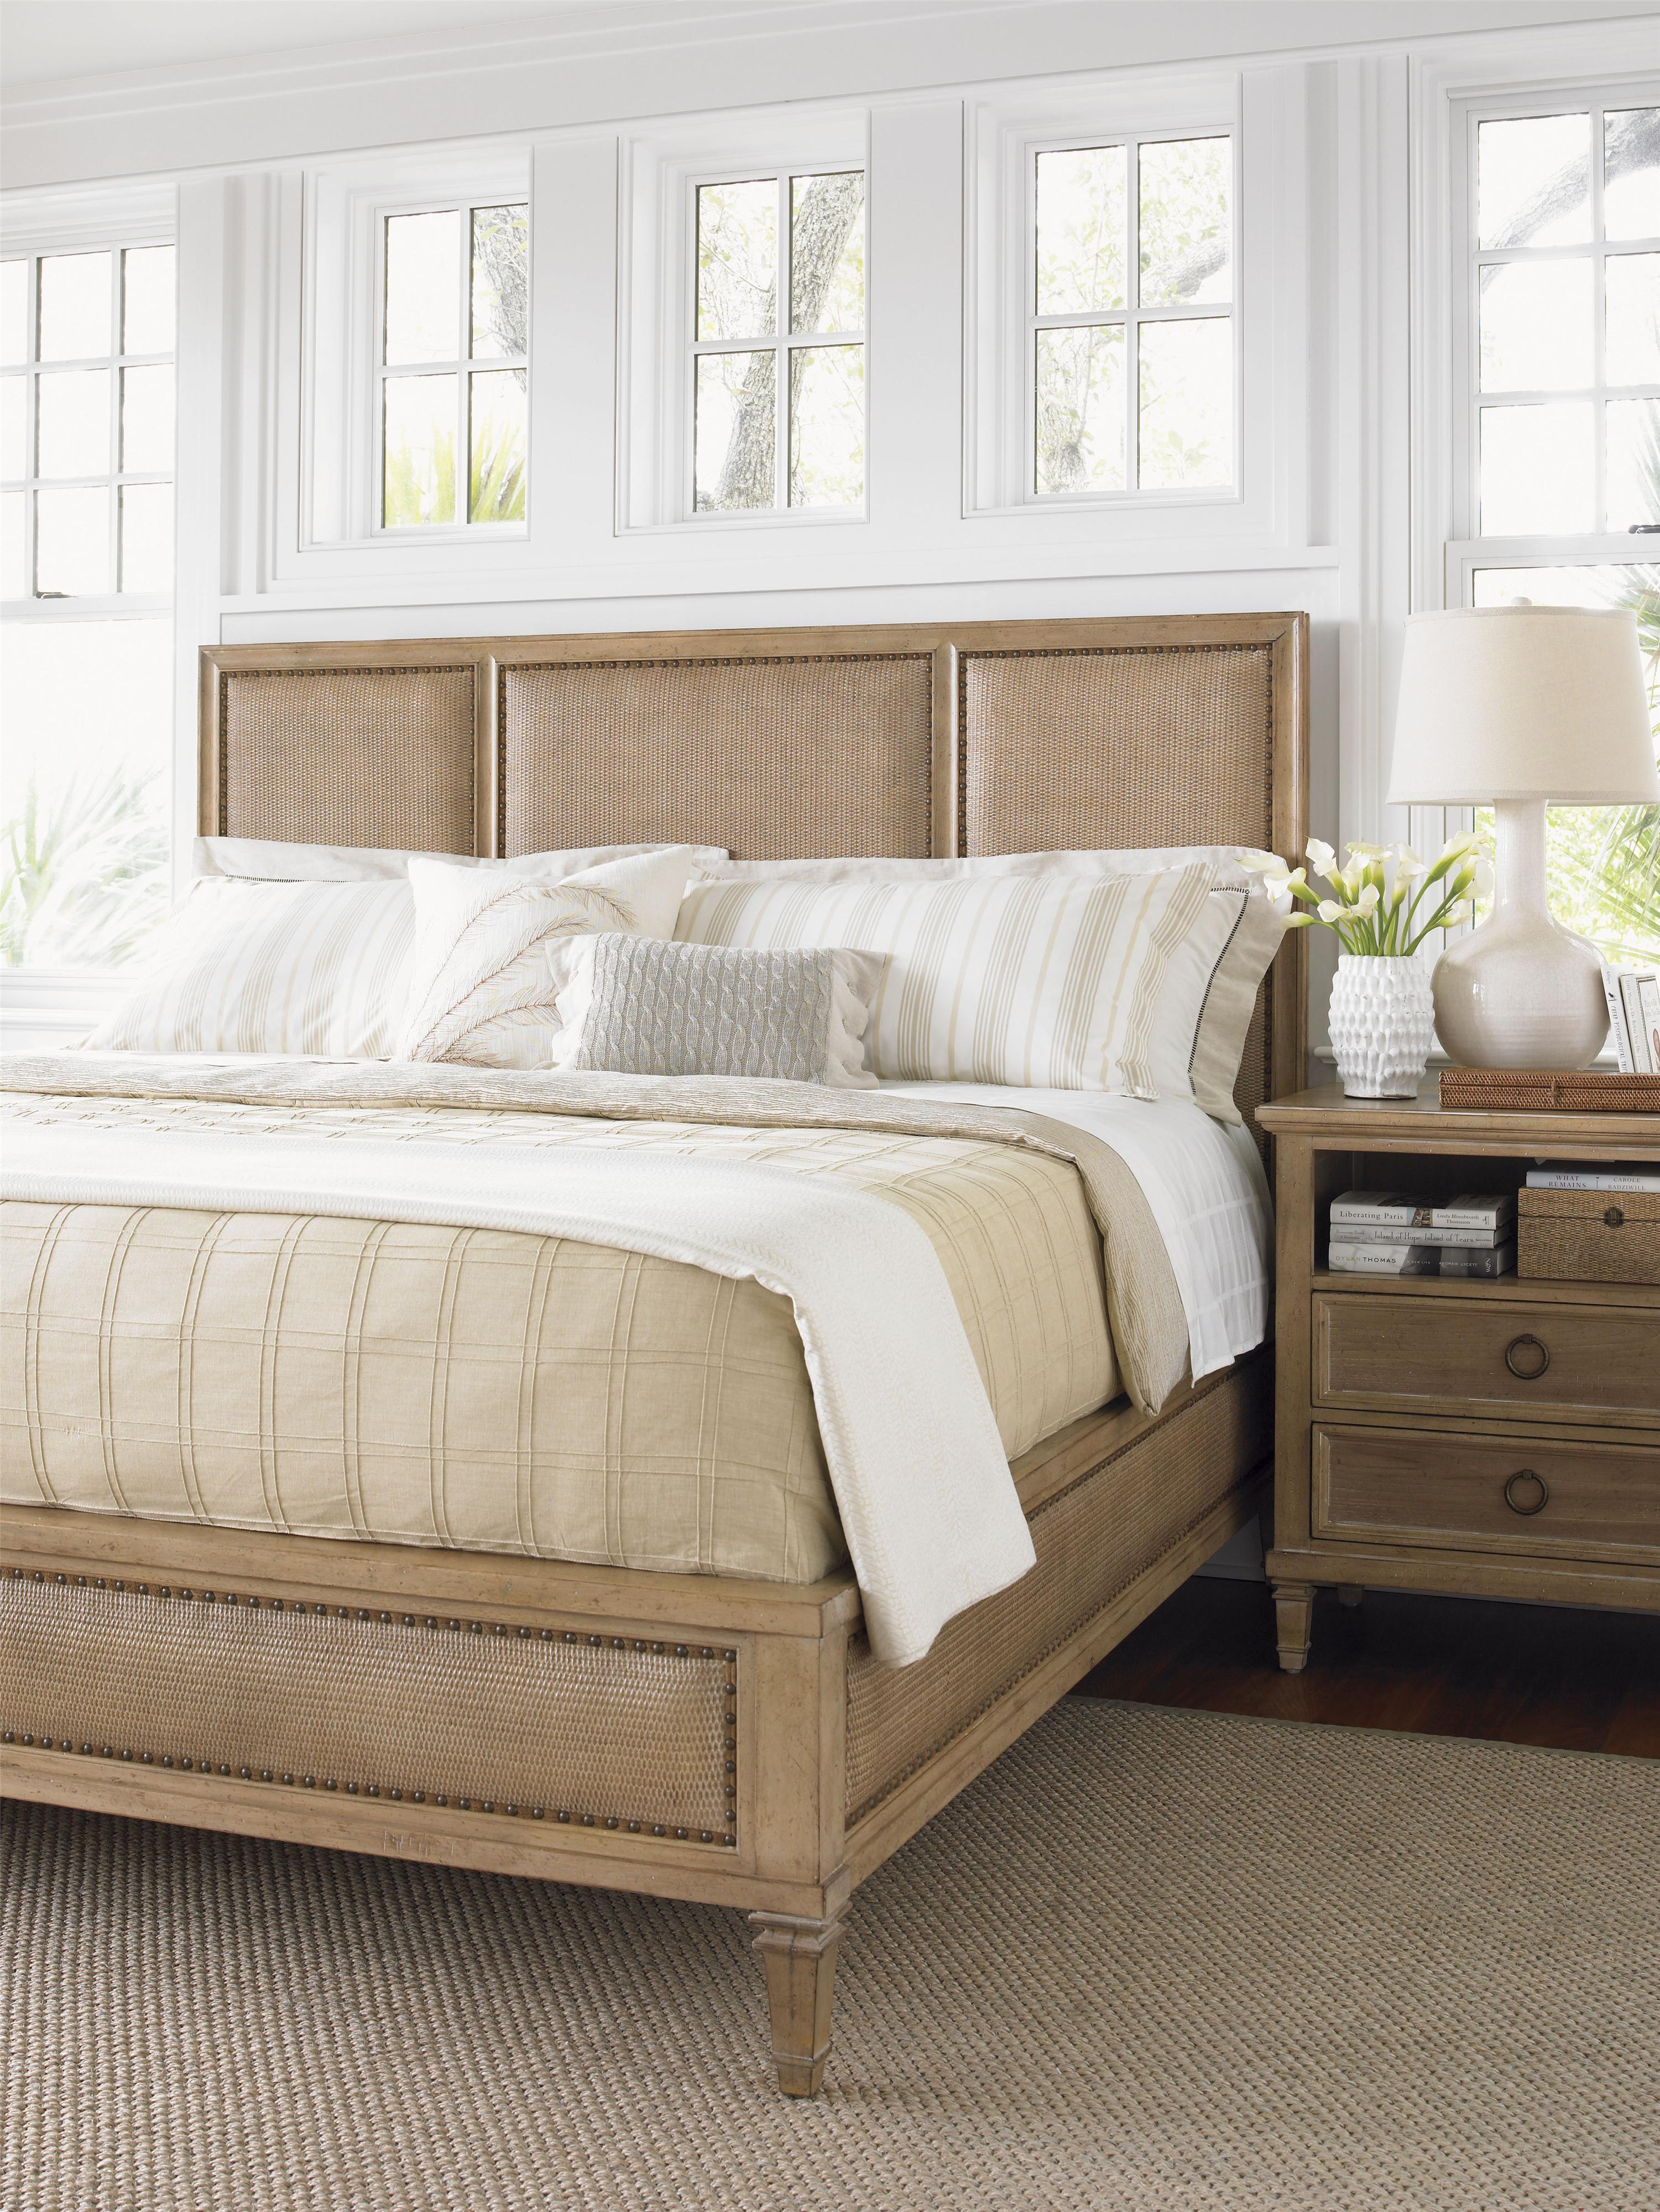 Lexington Monterey Sands 830 134c King Pacific Grove Bed Hudson 39 S Furniture Panel Beds